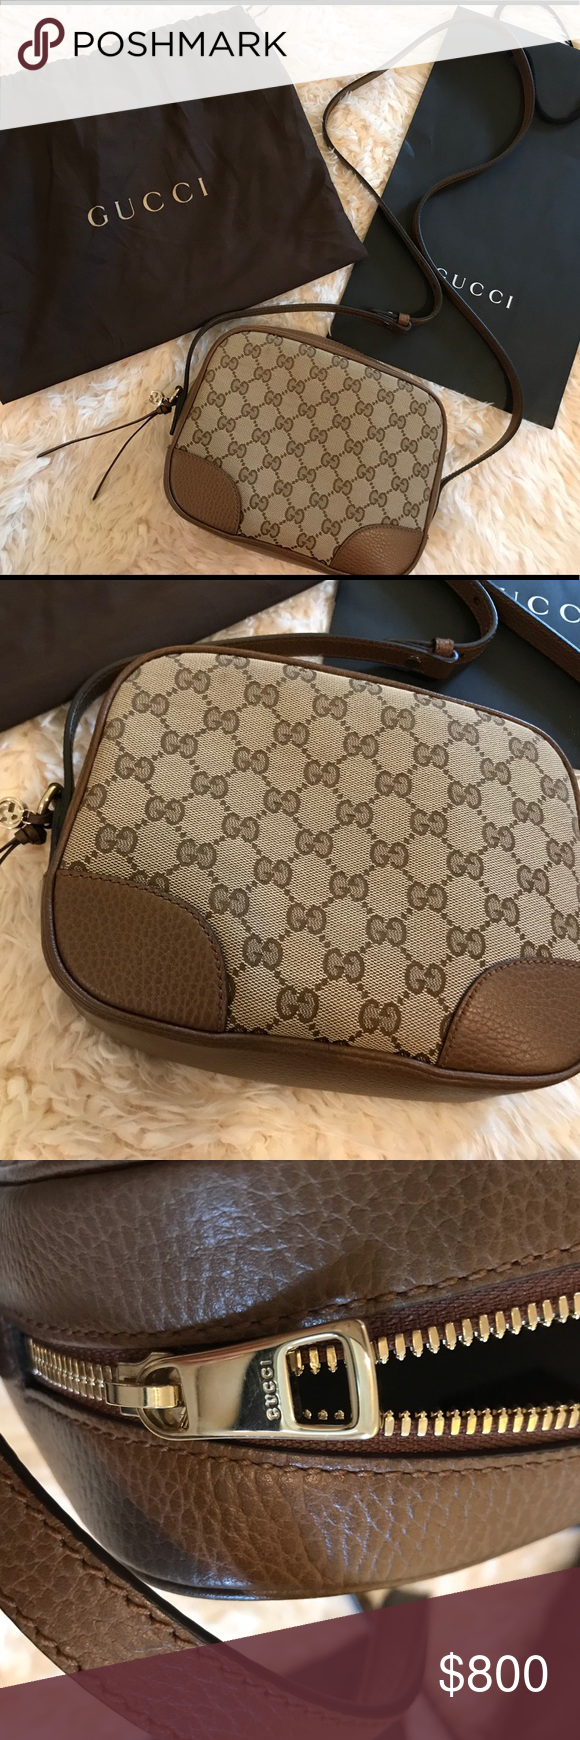 dcb9f86efc6376 Gucci Bree Disco Crossbody Bag Brand new and authentic Gucci Disco Bree  Crossbody Bag. I